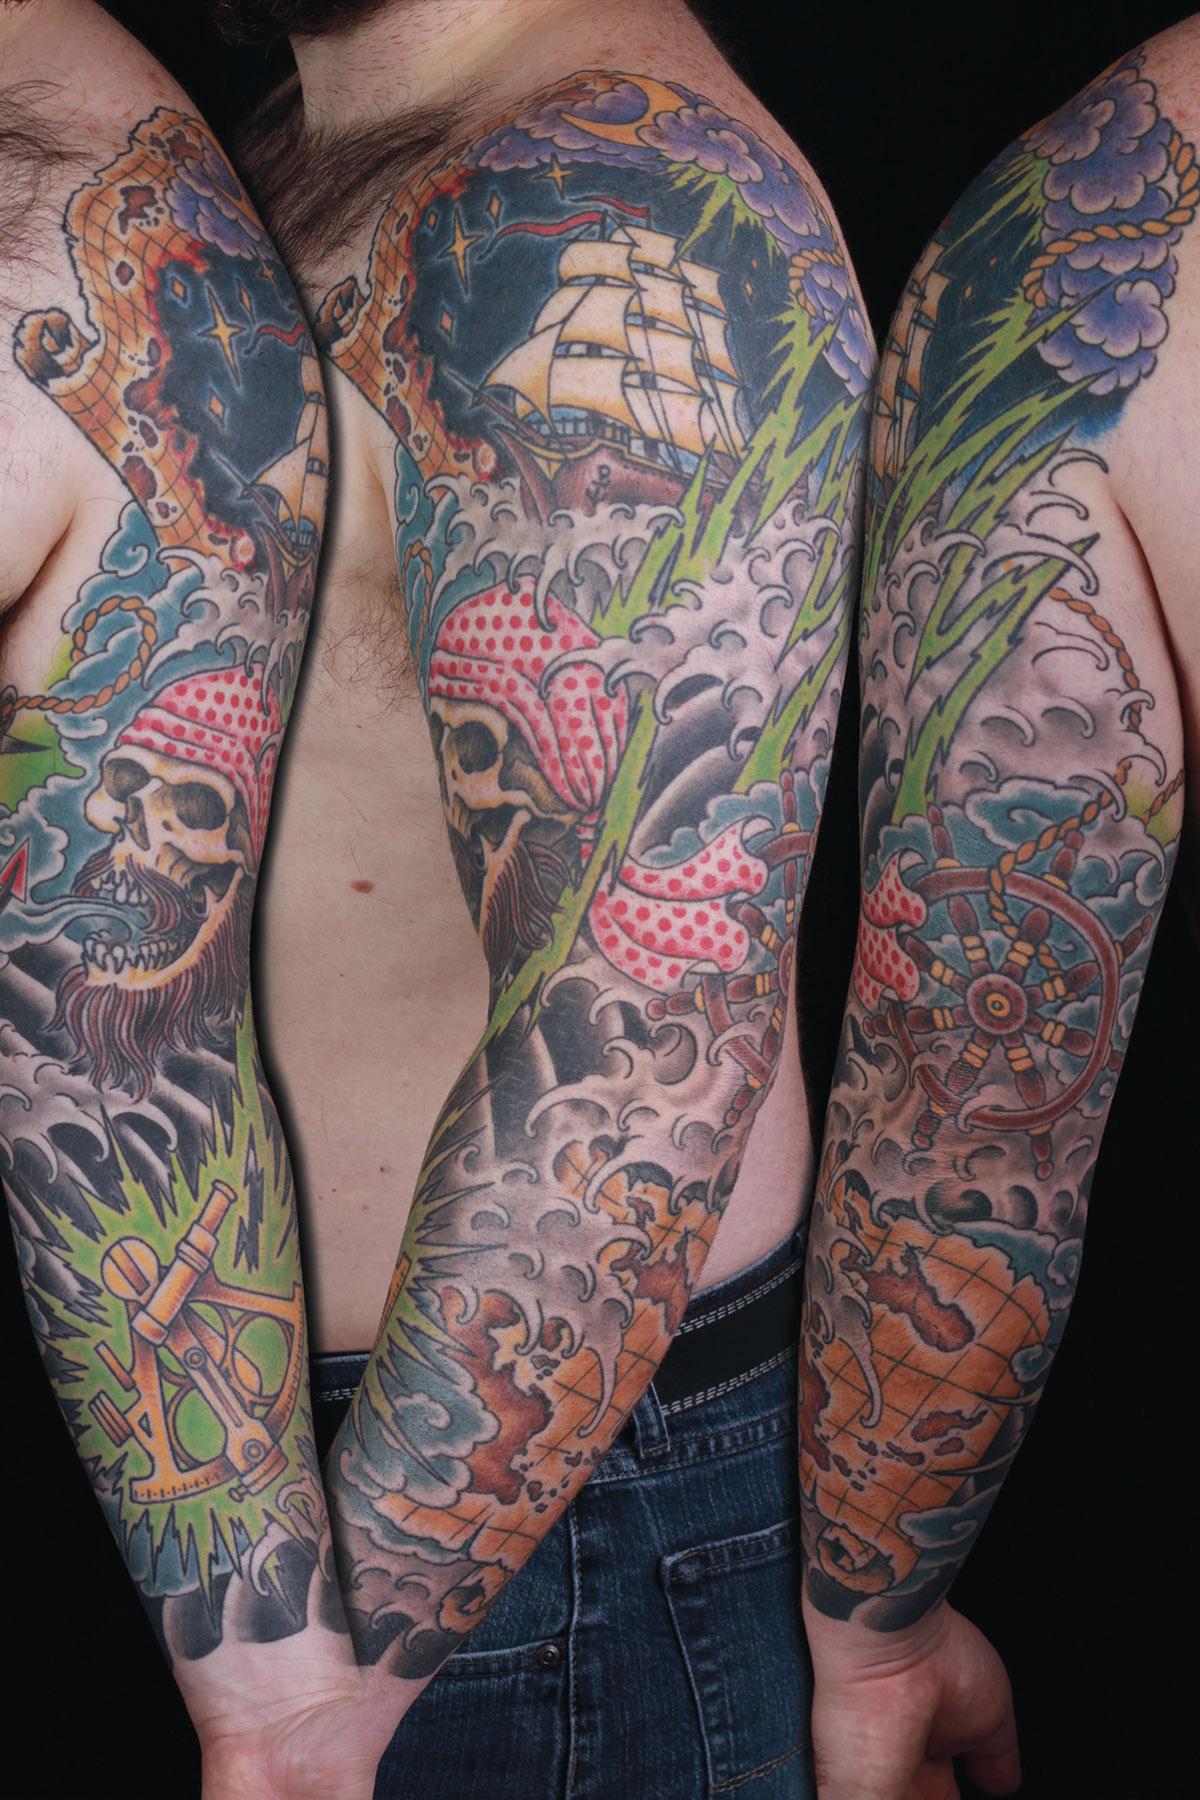 sam-yamini-dedication-tattoo-pirate-water-waves-ship-map-skull-compass-lightning-sleeve-arm